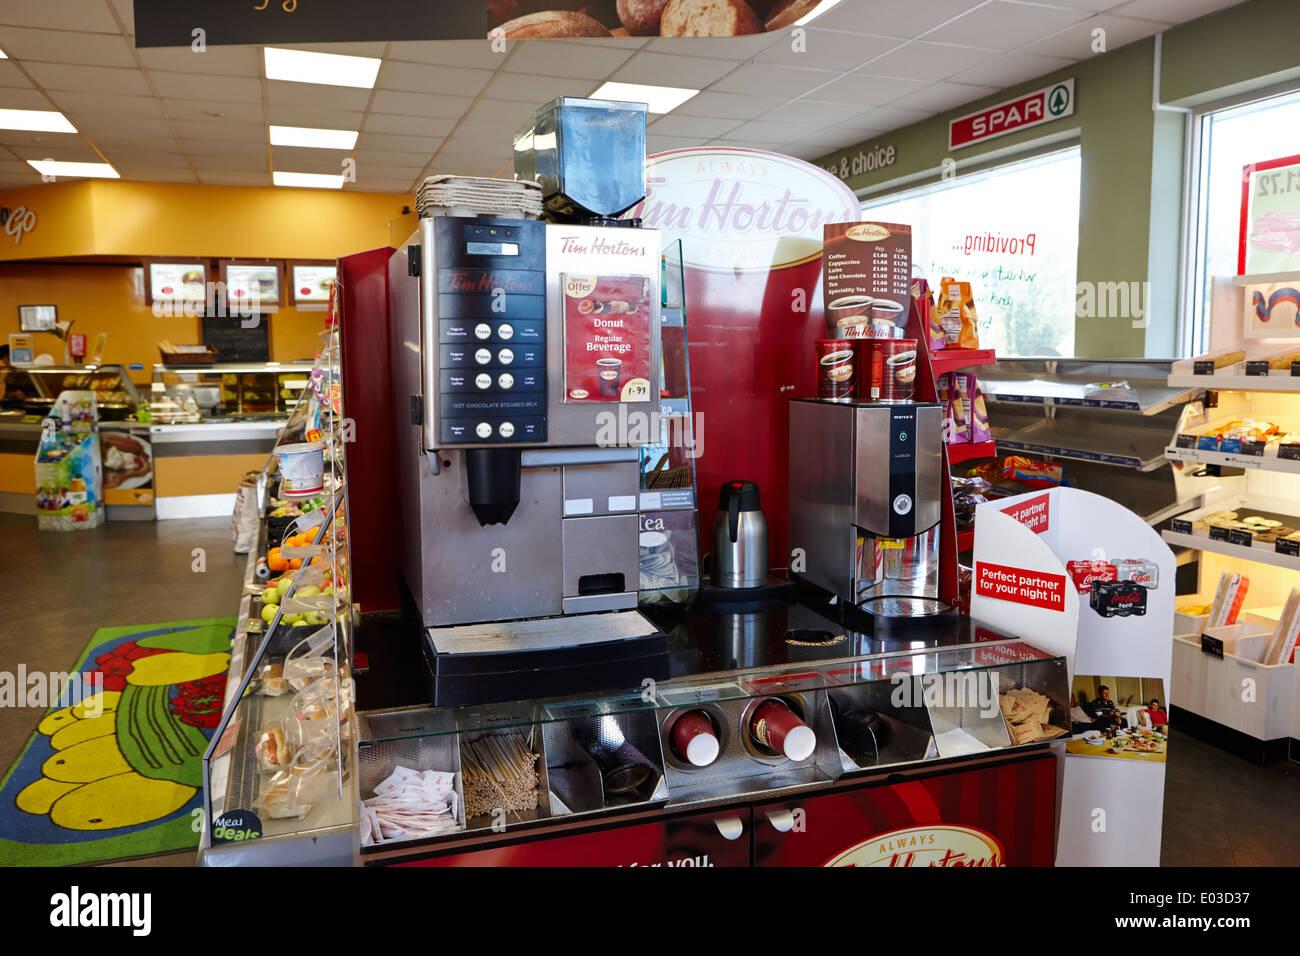 tim hortons coffee machine